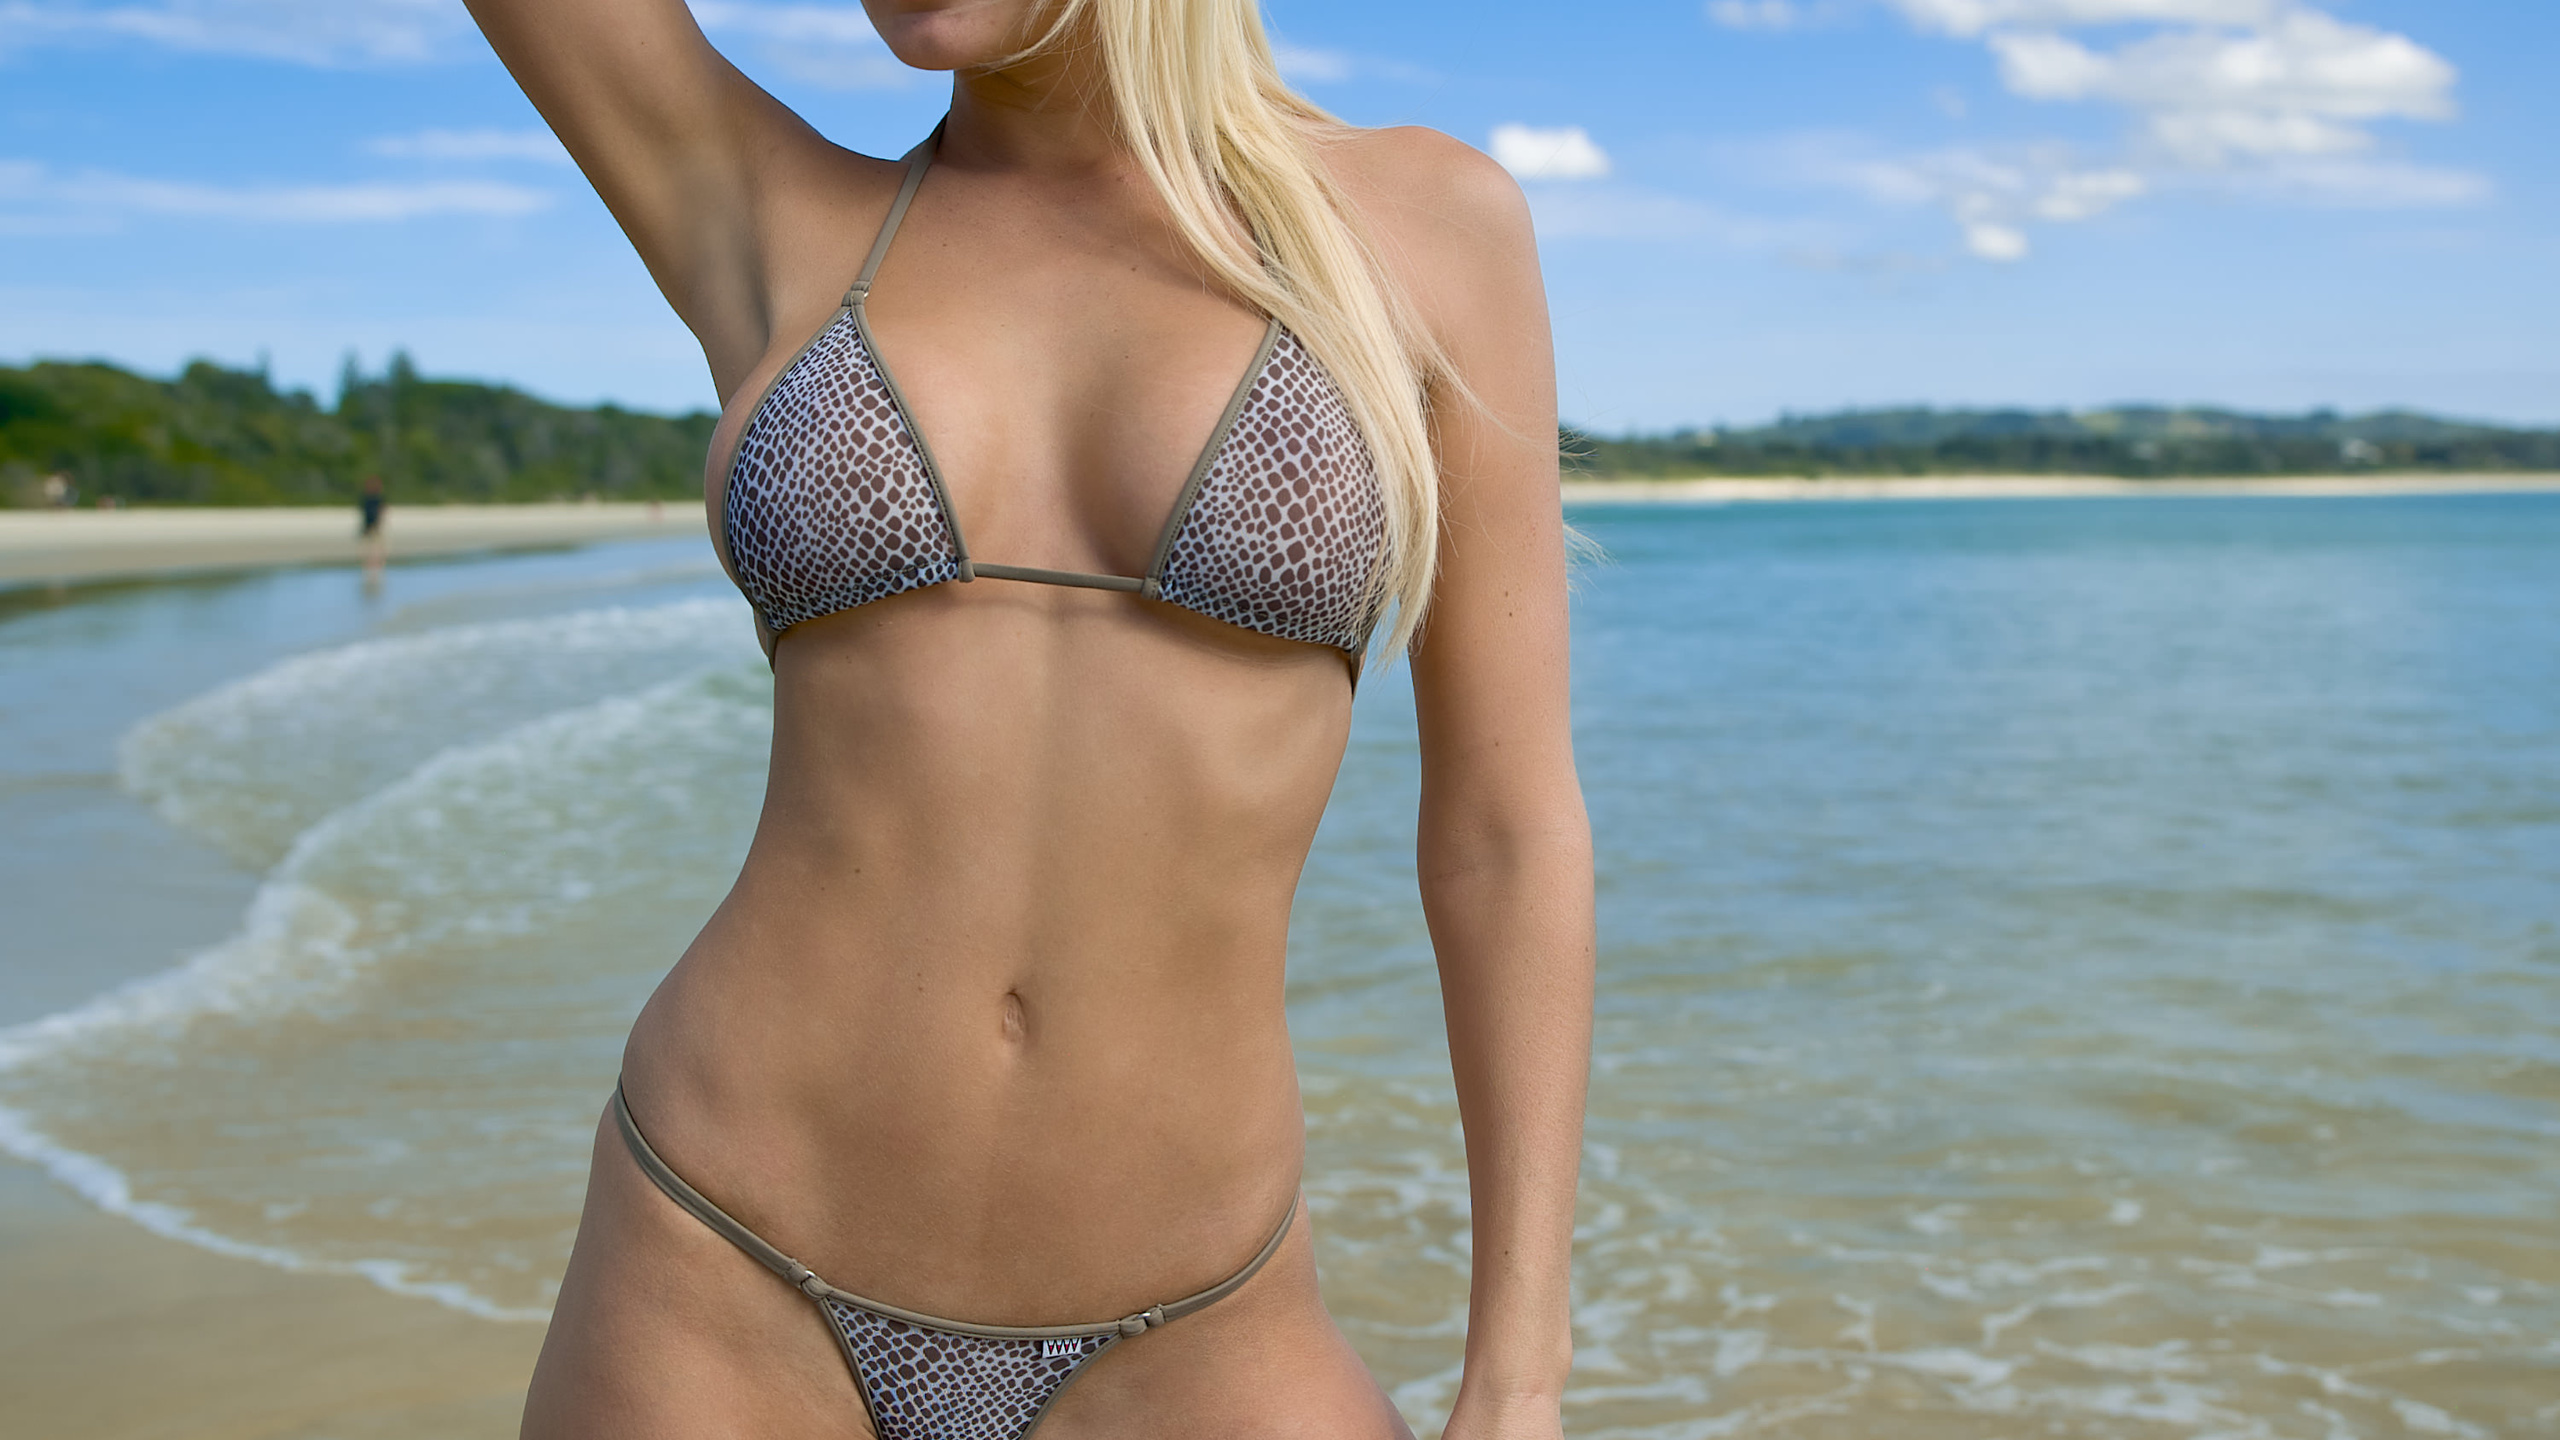 Тетка бикини на пляже фото купальник белокурые лесби порно